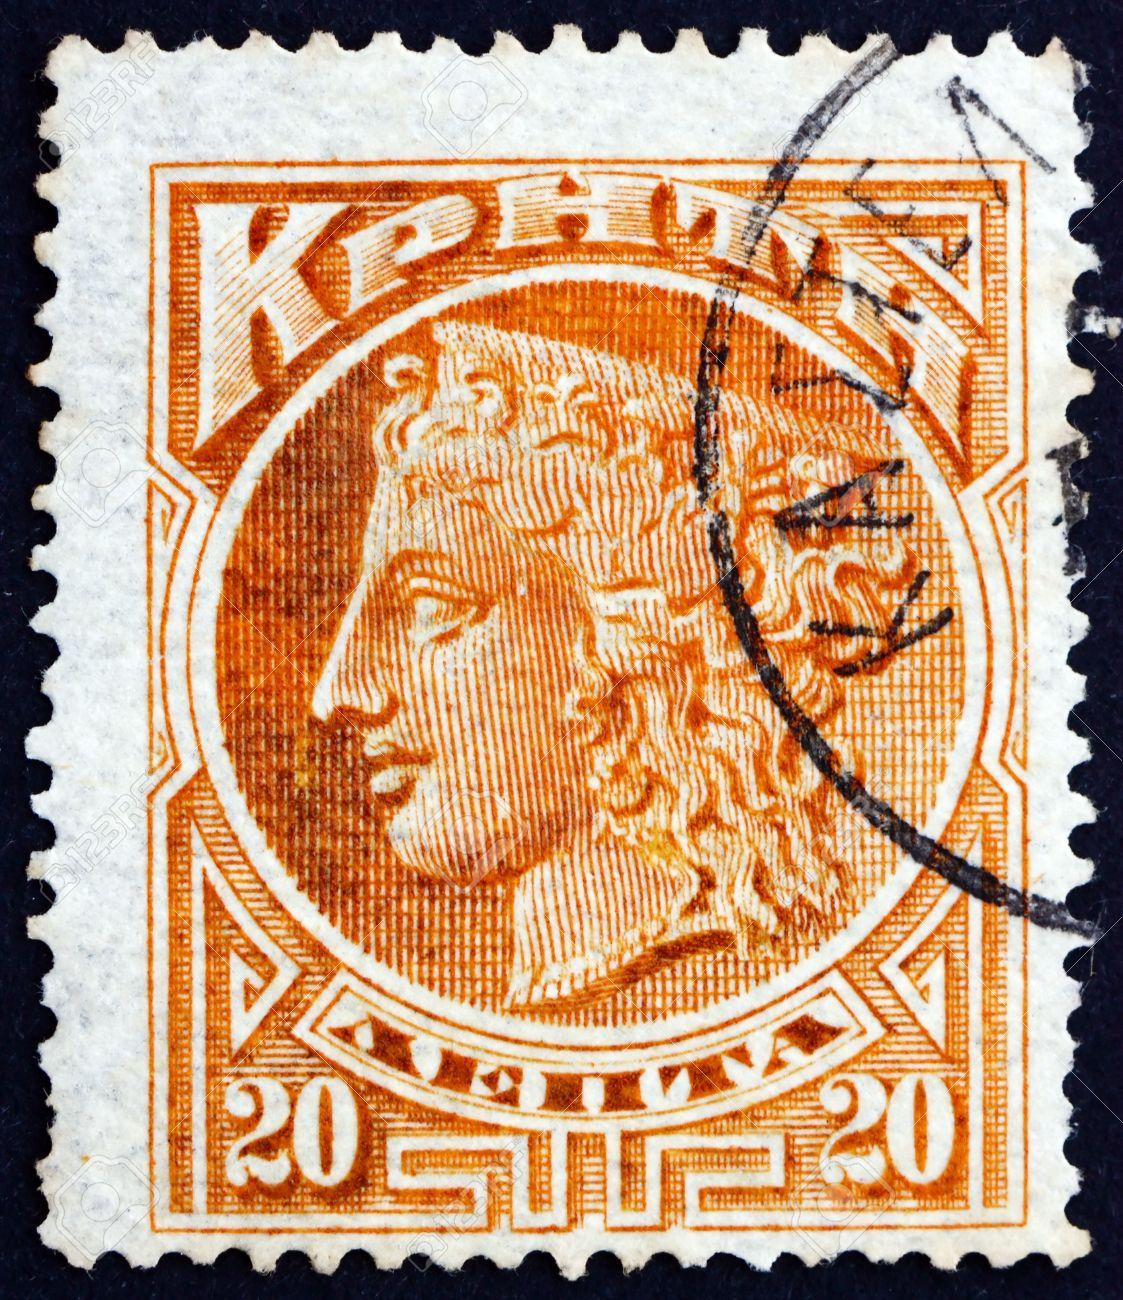 CRETE - CIRCA 1900: a stamp printed in the Greece shows Hera,